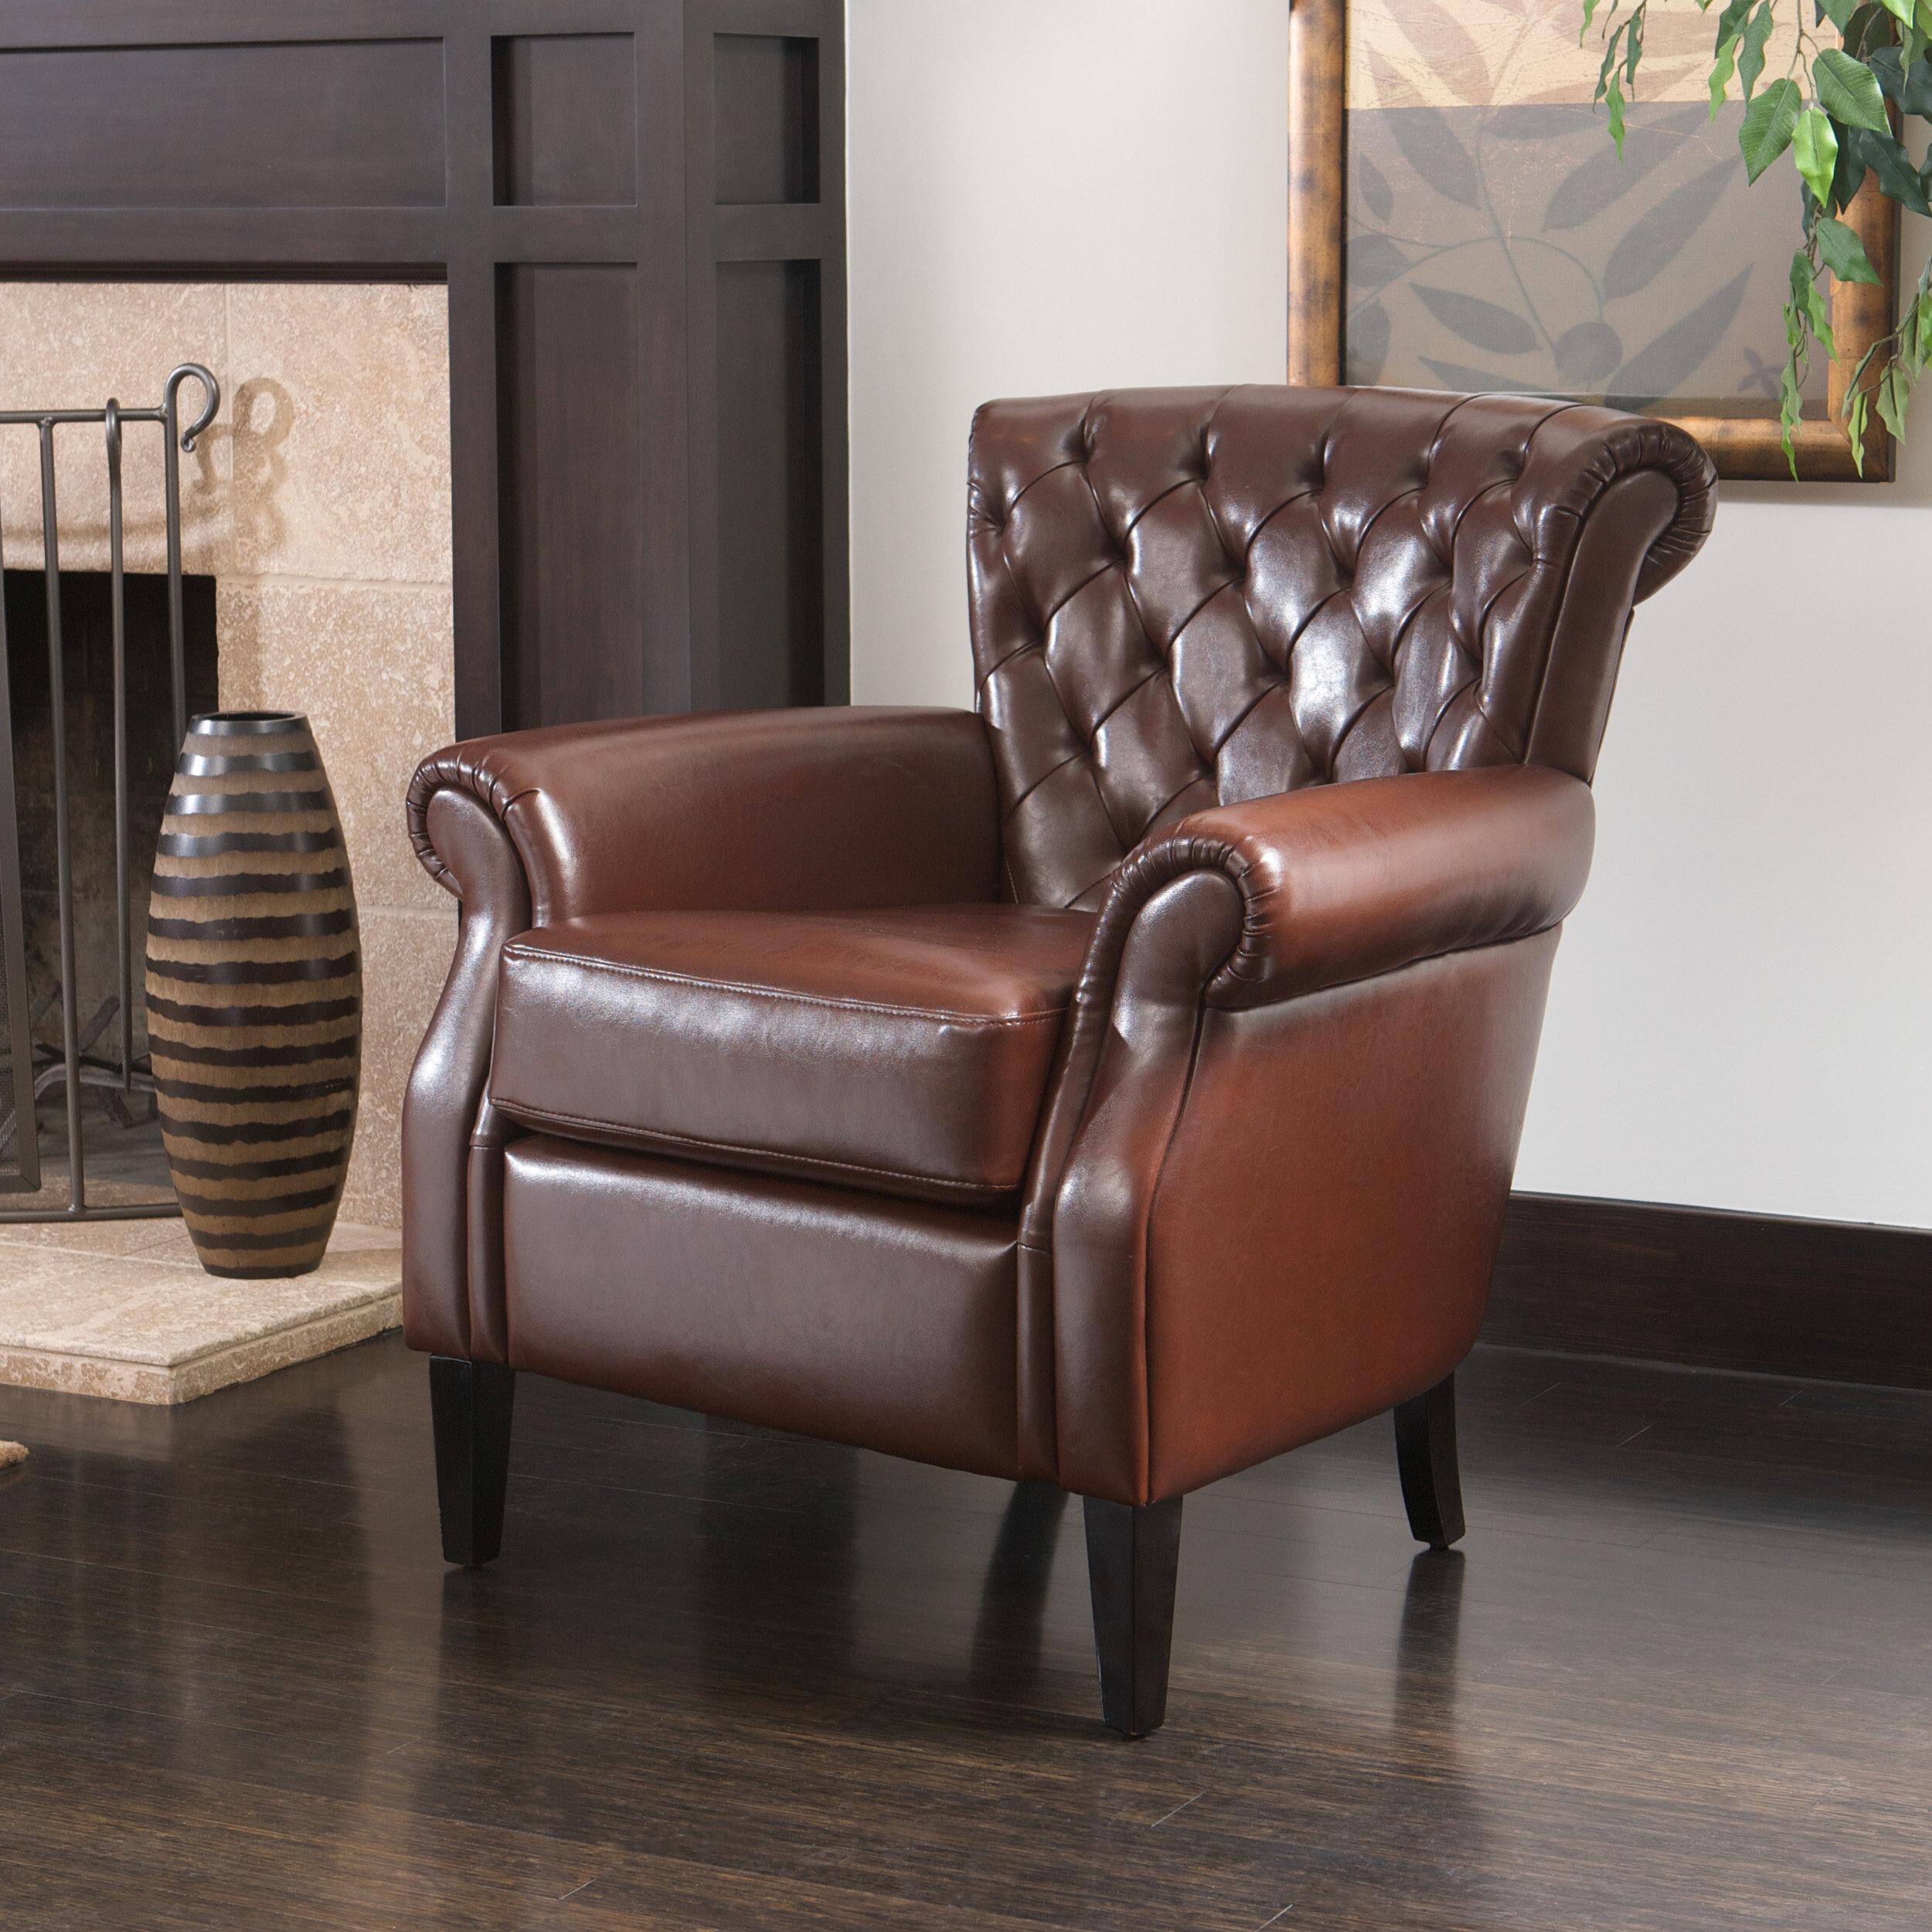 Charlton Home Lemke 35 25 W Tufted Faux Leather Club Chair Reviews Wayfair